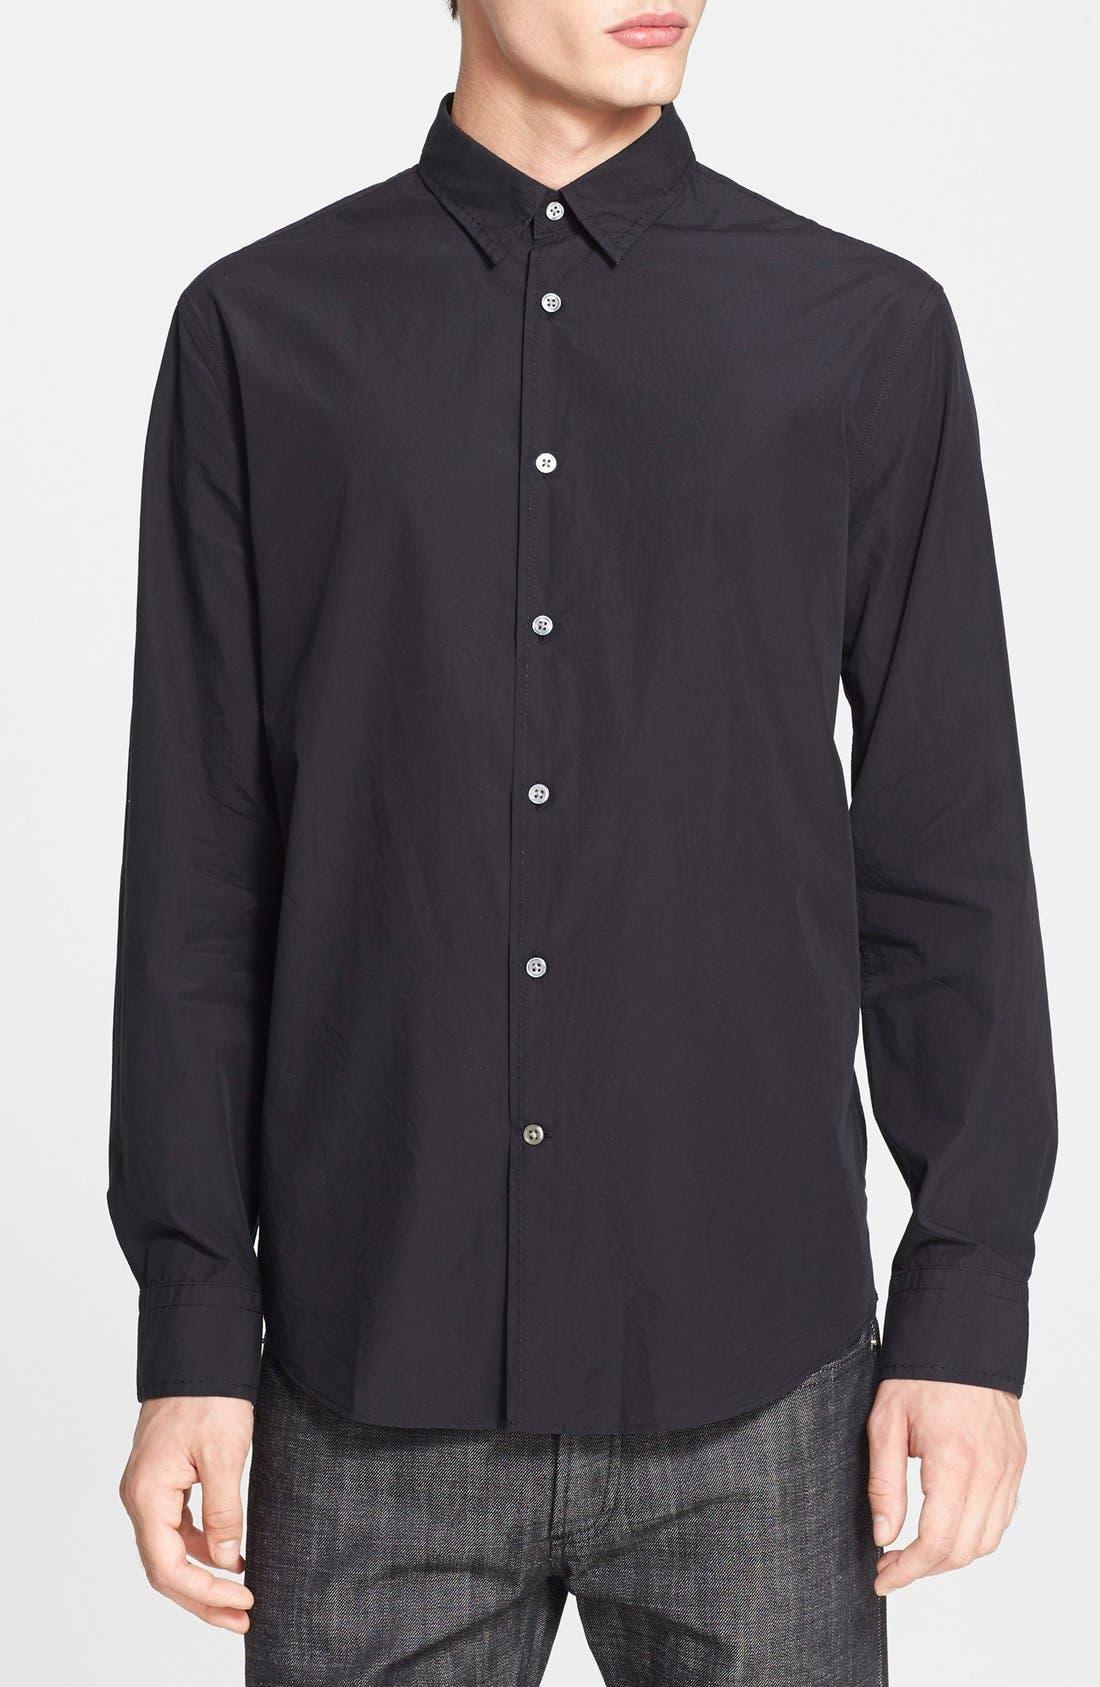 Alternate Image 1 Selected - John Varvatos Collection Extra Trim Fit Sport Shirt